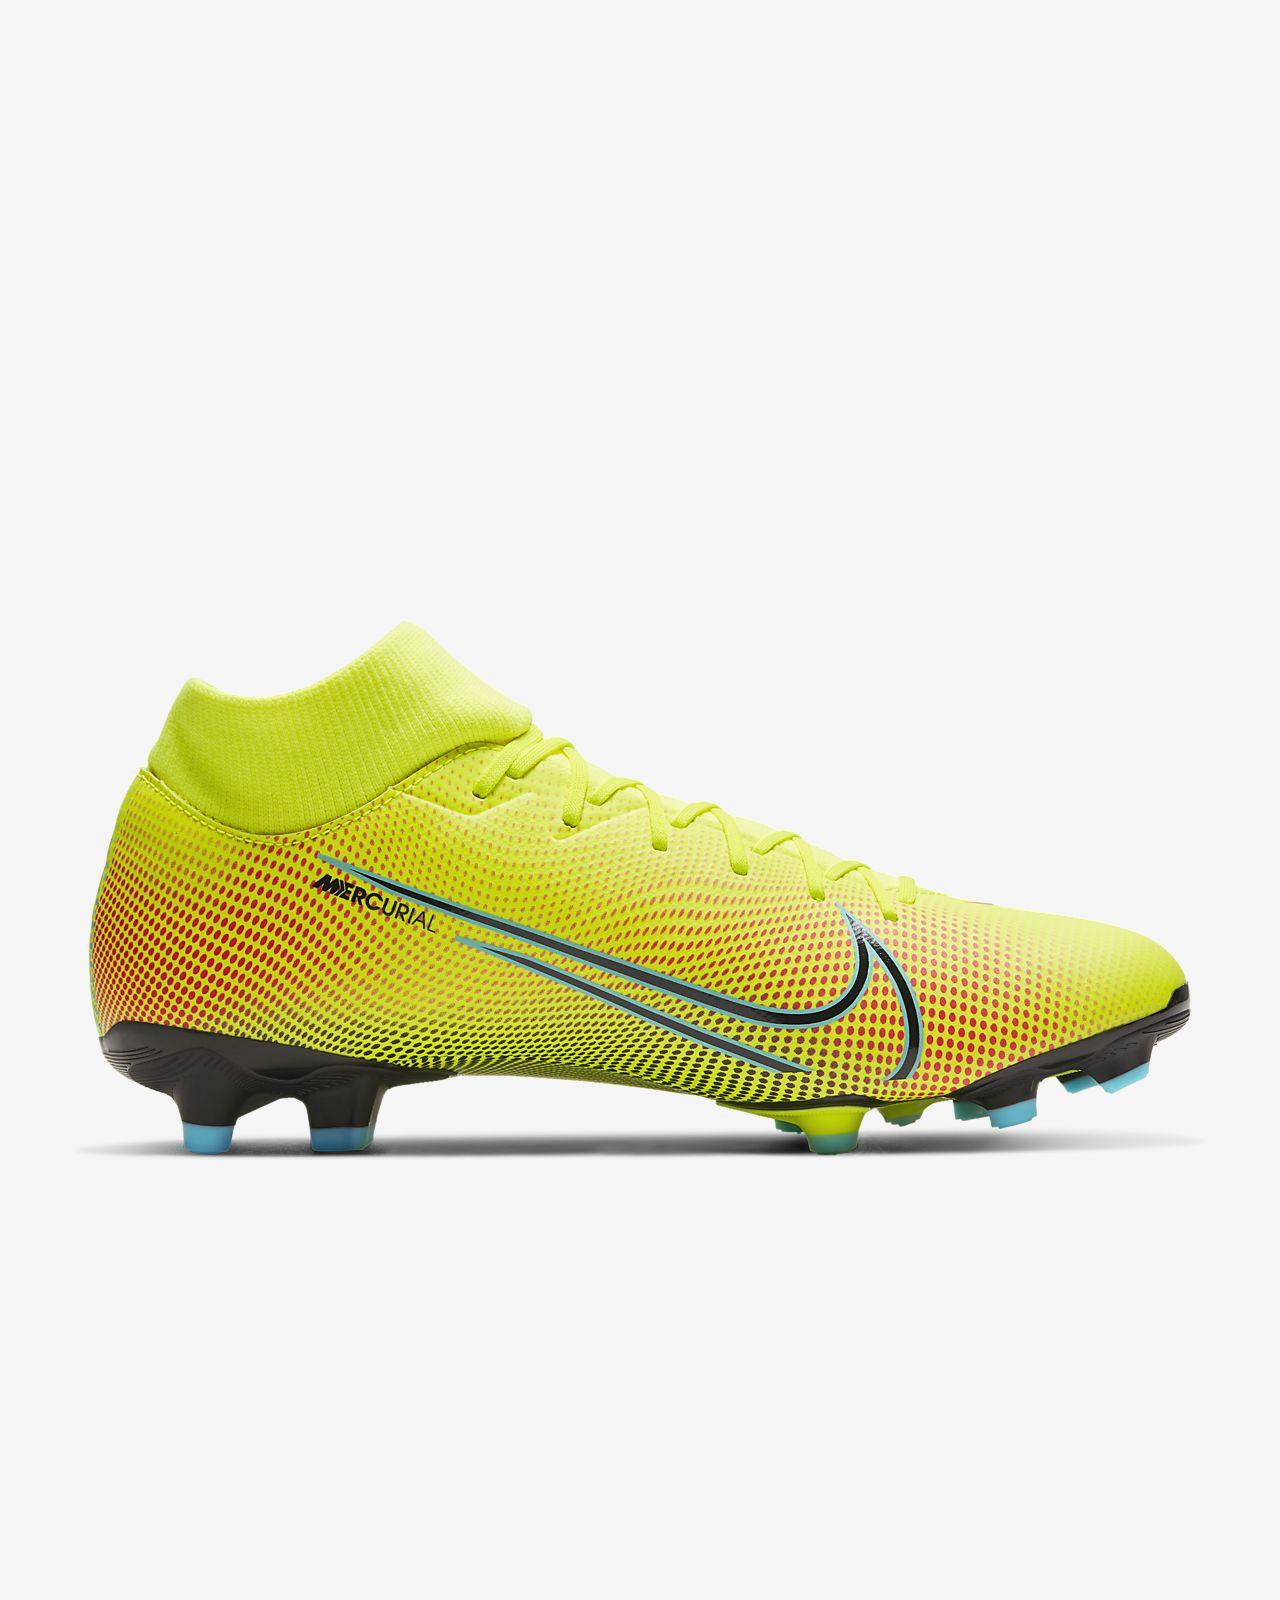 Nike Youth Mercurial Superfly VI Academy Neymar Jr Multi Ground Cleats